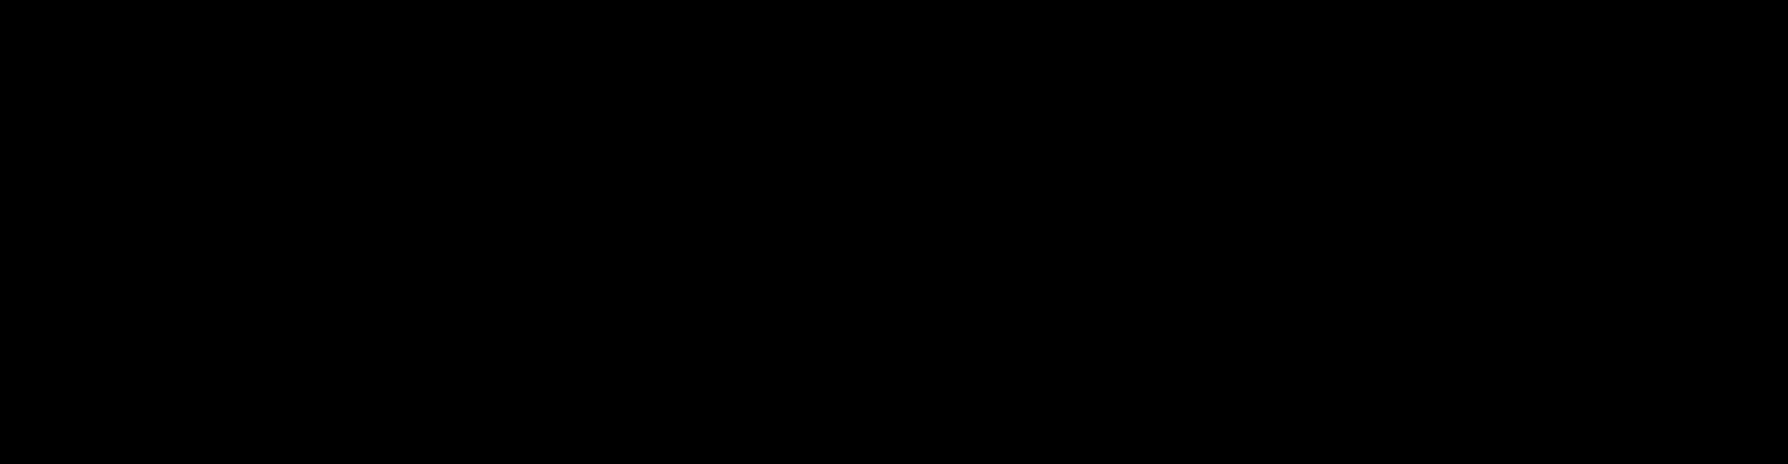 Картинки по запросу roland logo